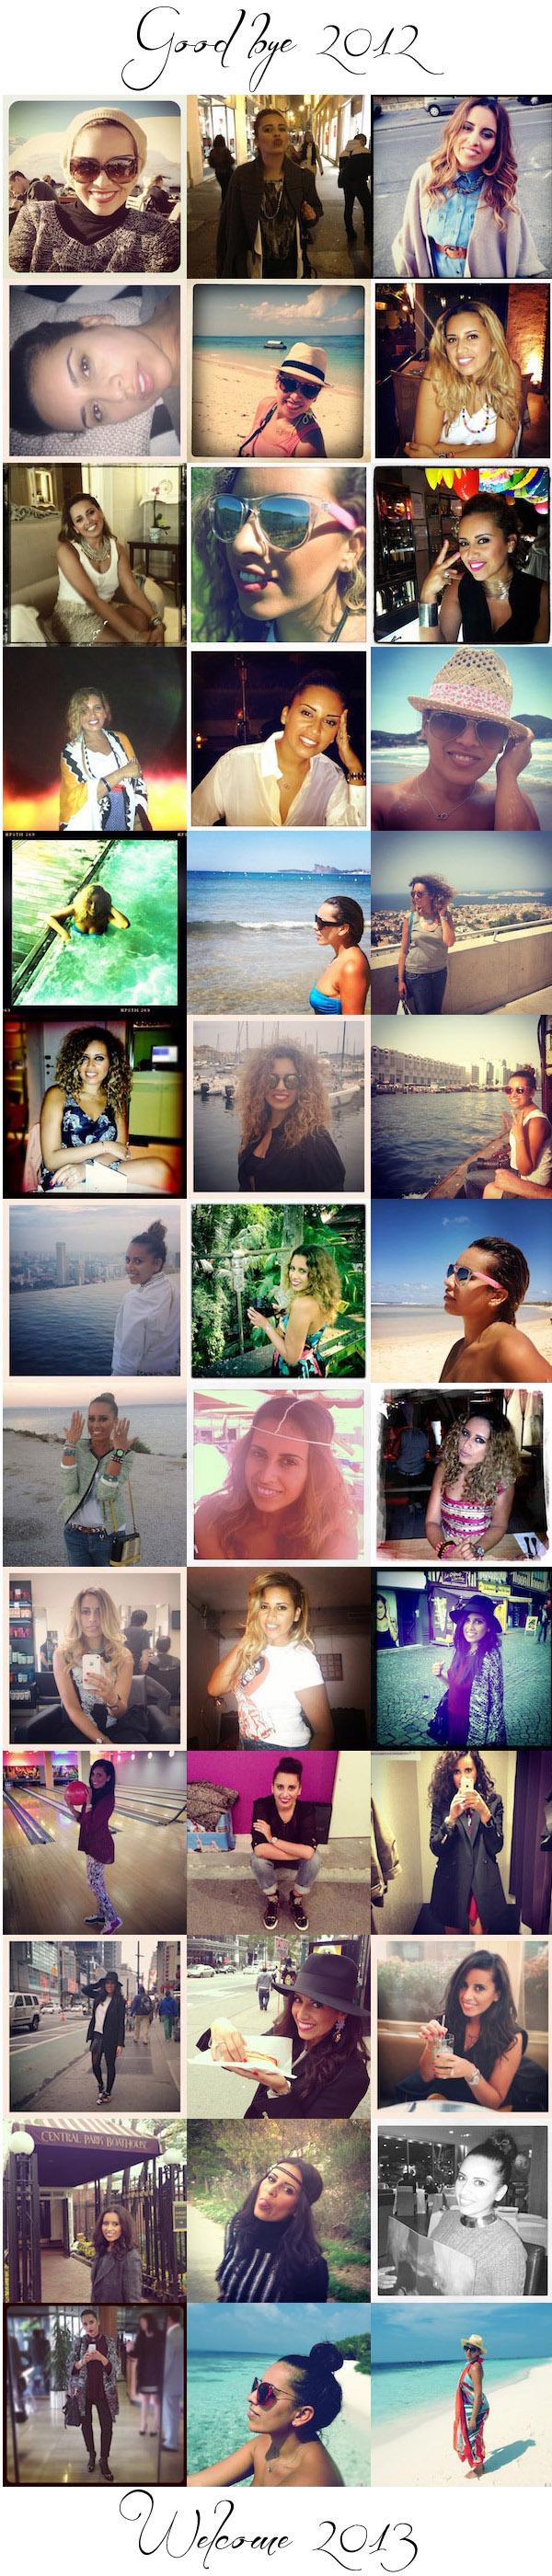 Retro Instagram LL 2012